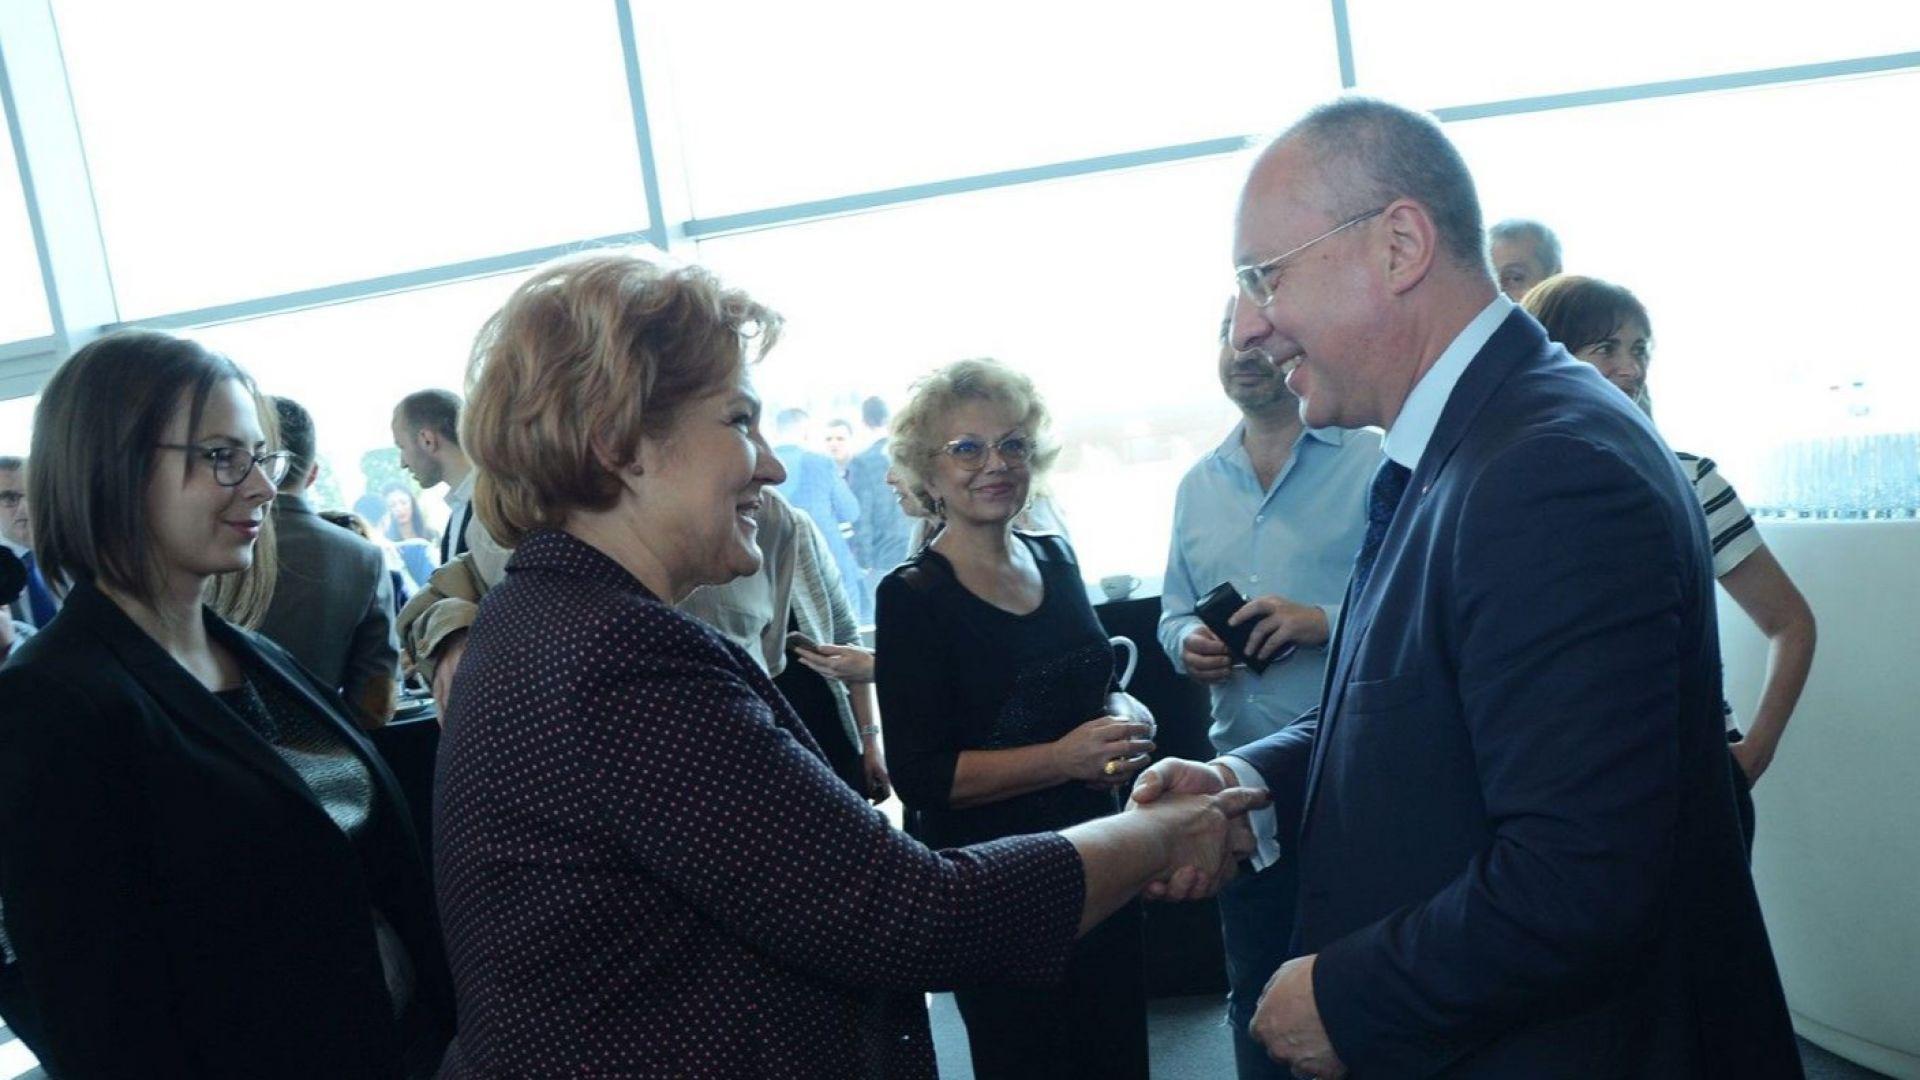 Сергей Станишев посреща гостите на конференцията